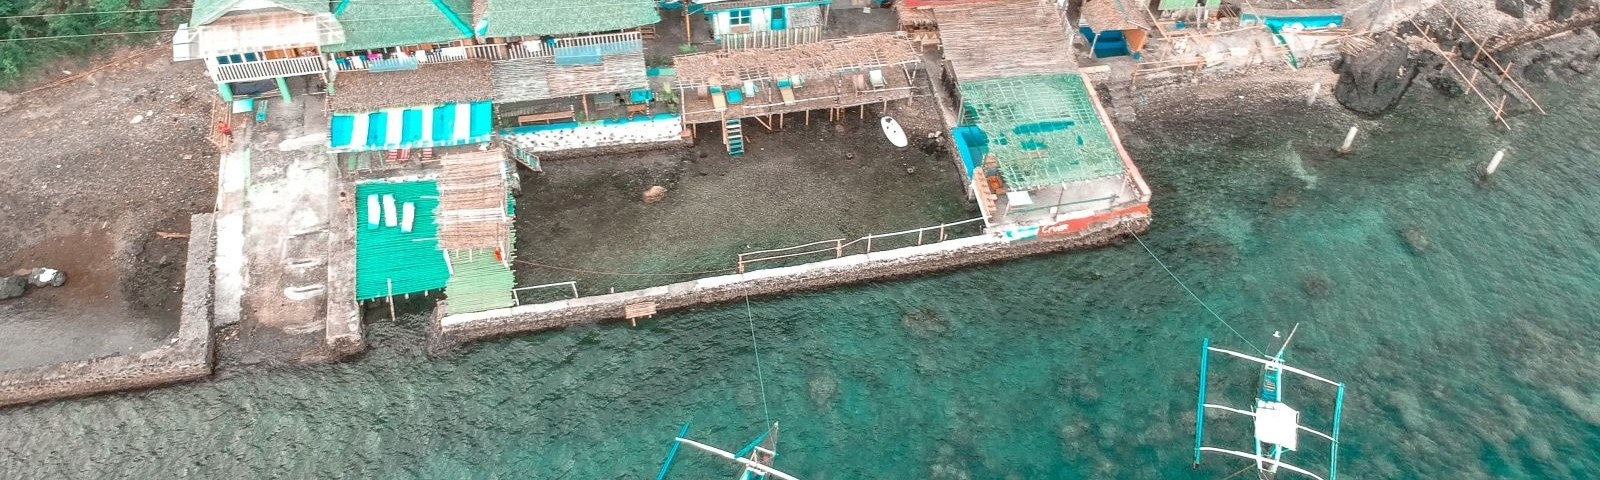 Summer Cruise in Batangas